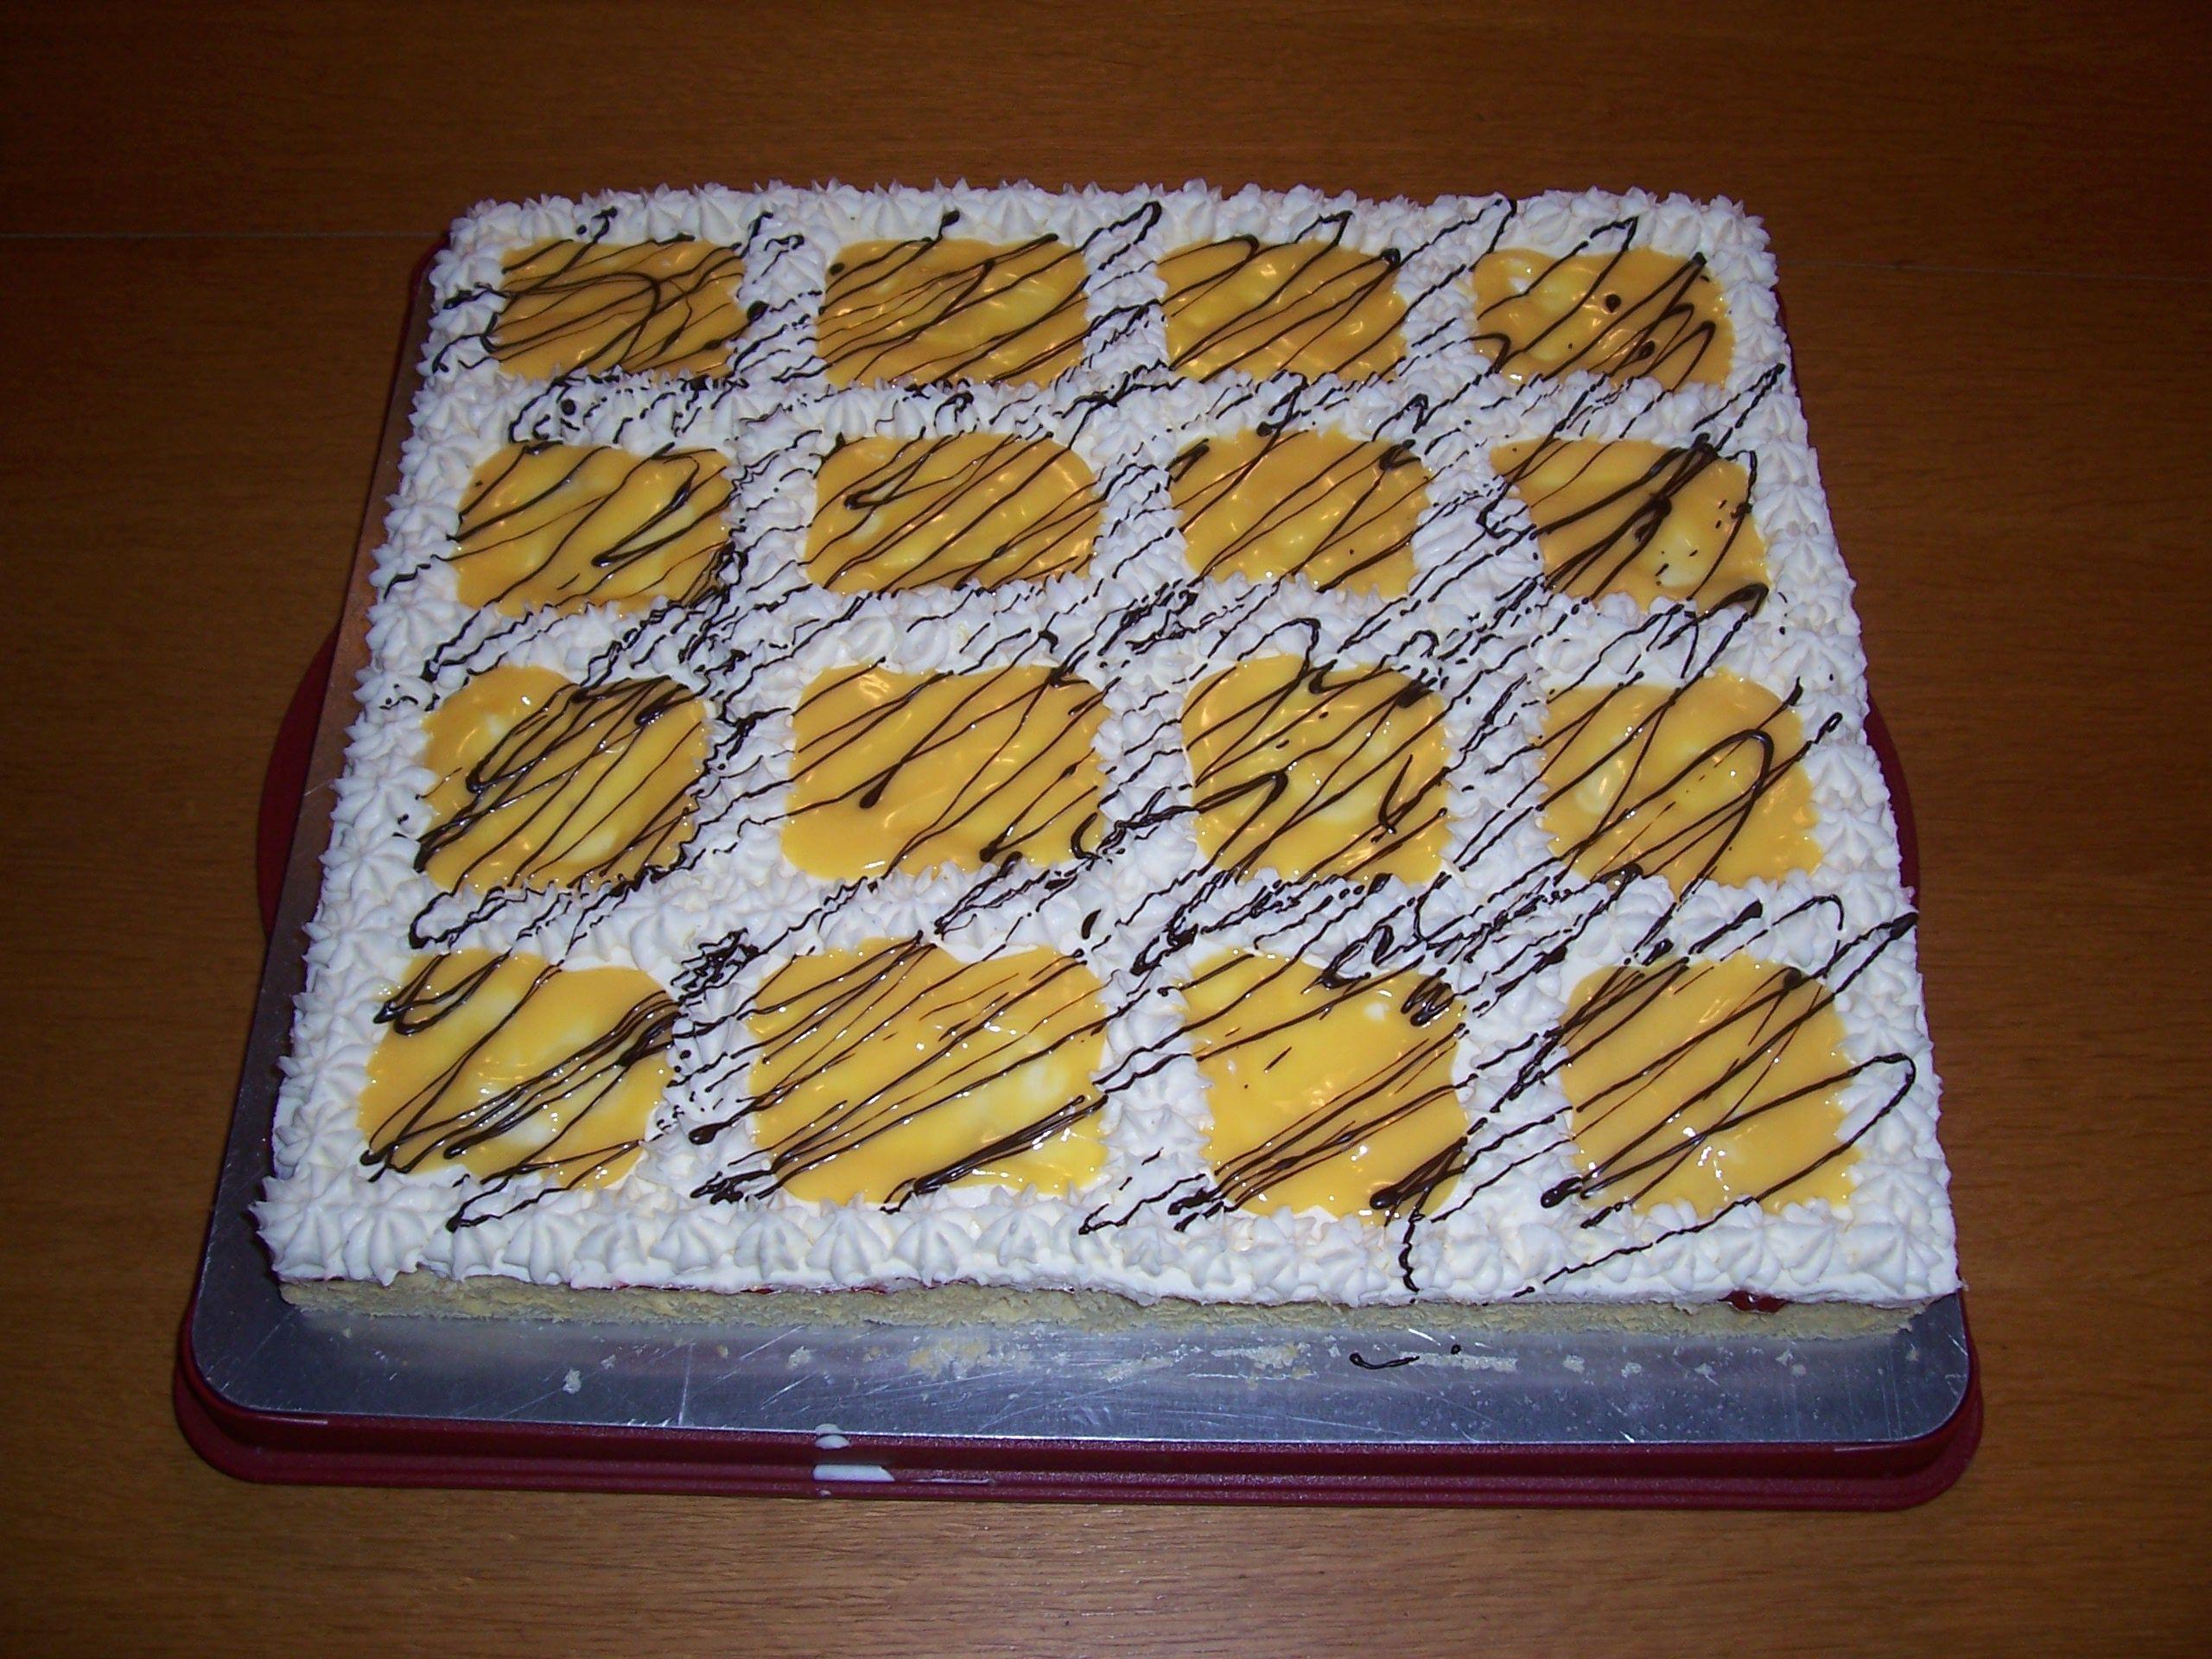 Rezept Beschwipste Banane - Blechkuchen von spatzele13 - Rezept der Kategorie Backen süß